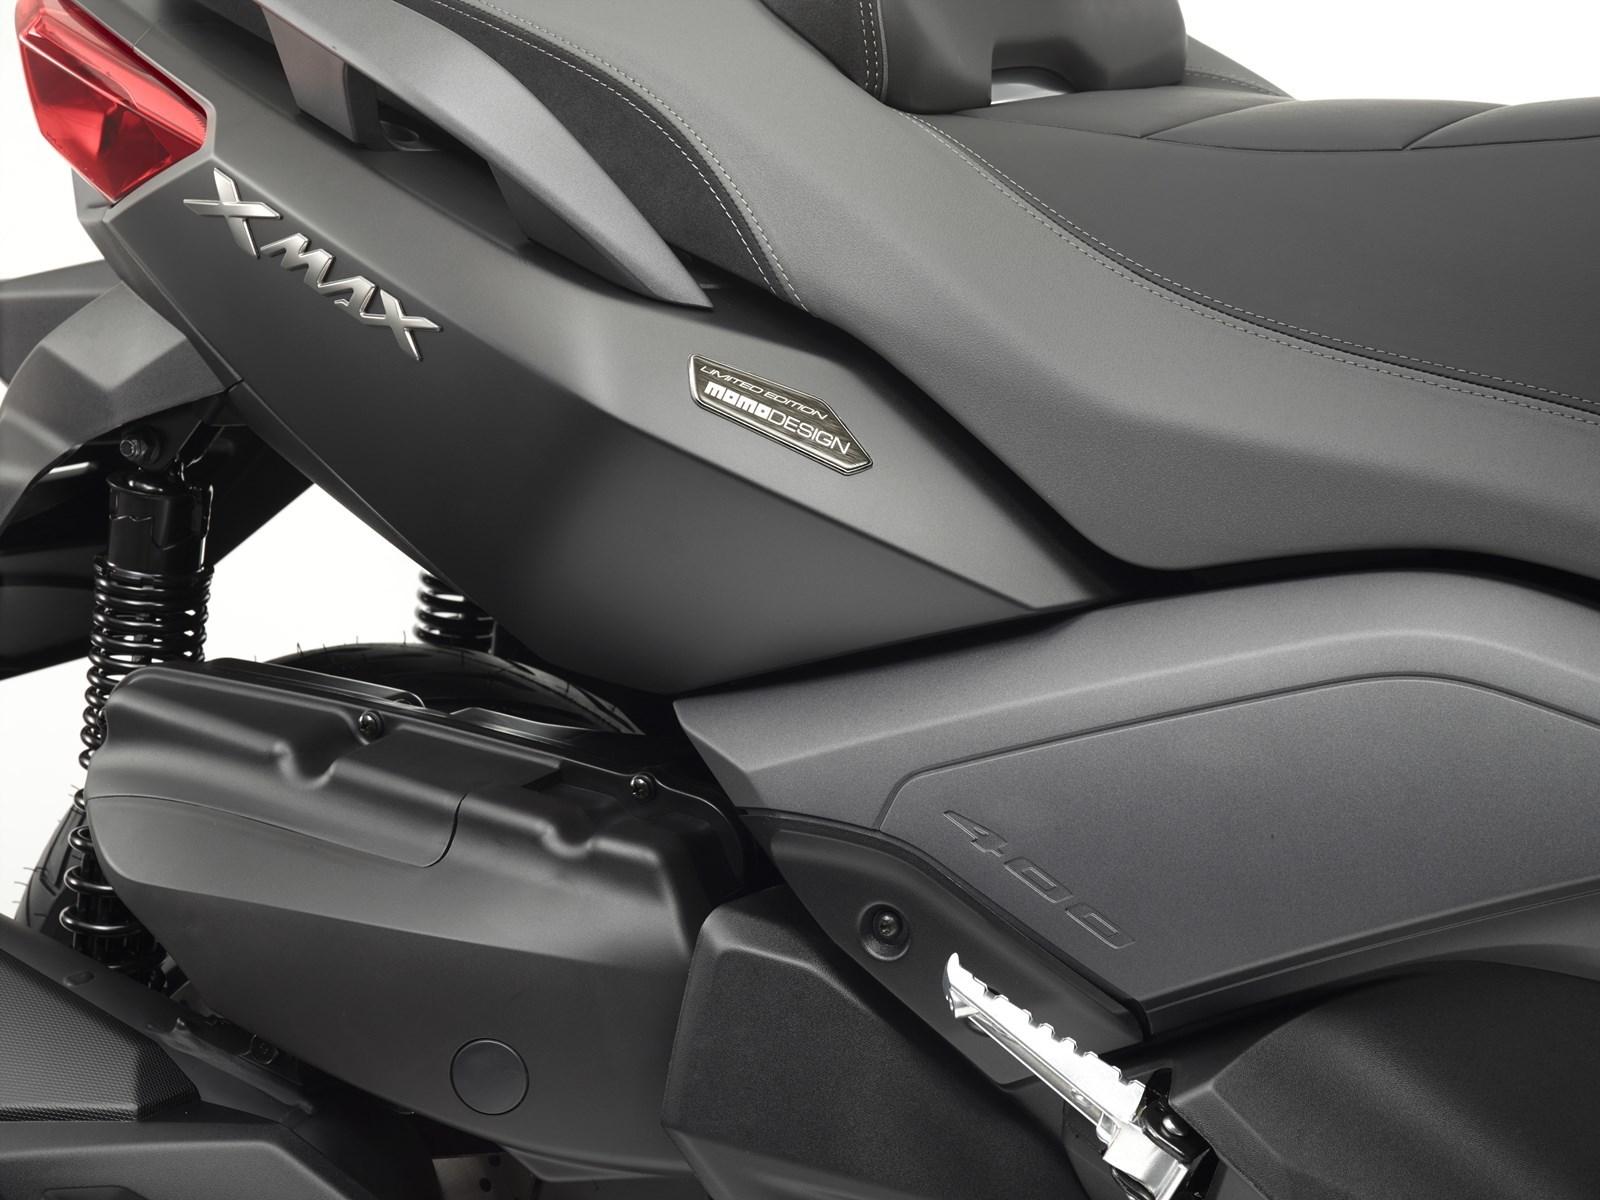 Foto de Yamaha X-MAX 400 MOMODESIGN, estudio y detalles (28/33)